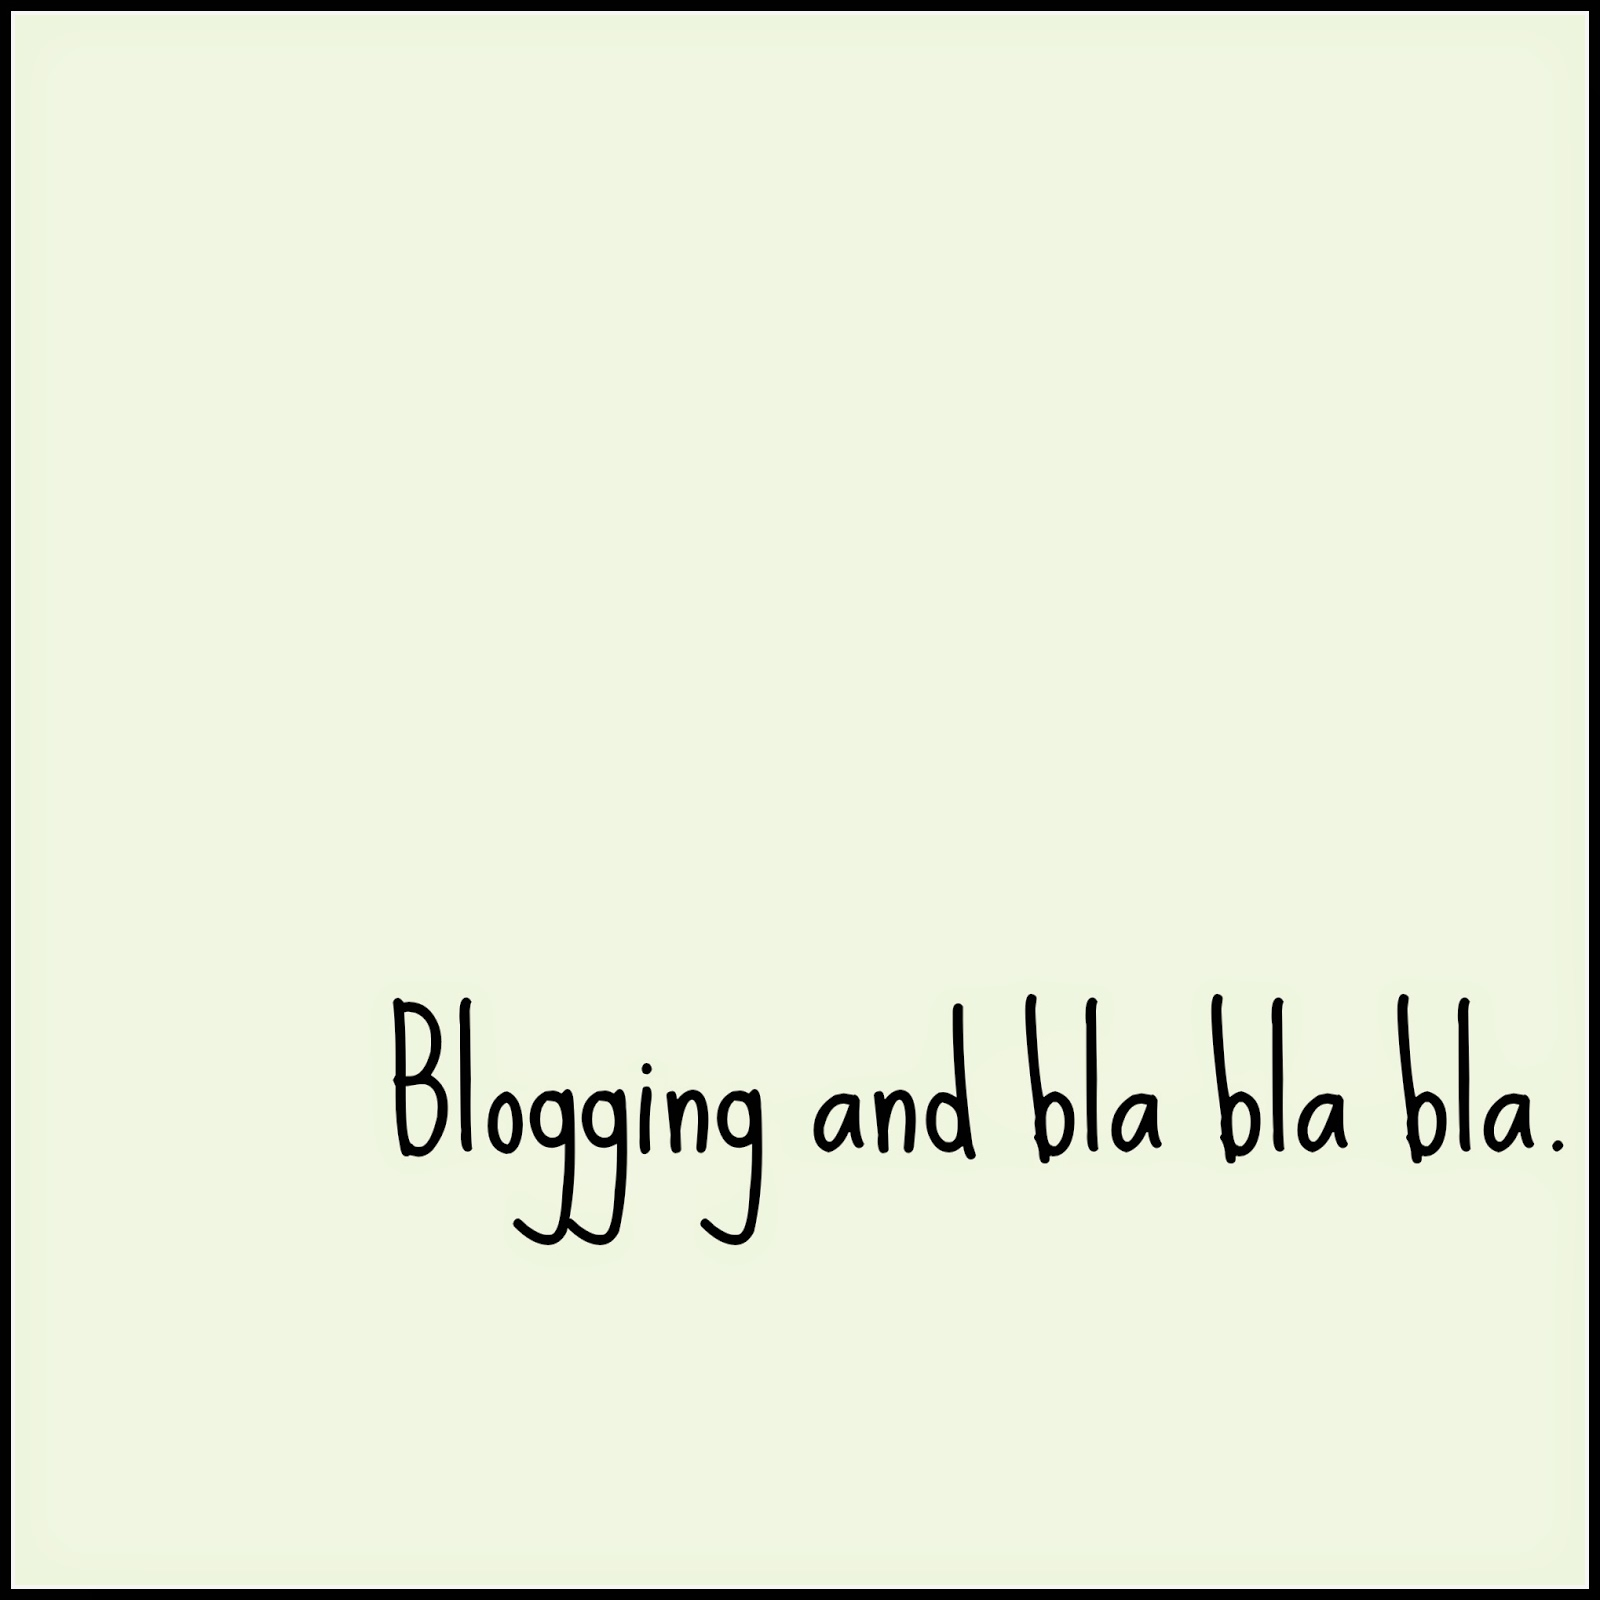 Blogging and Bla Bla Bla.